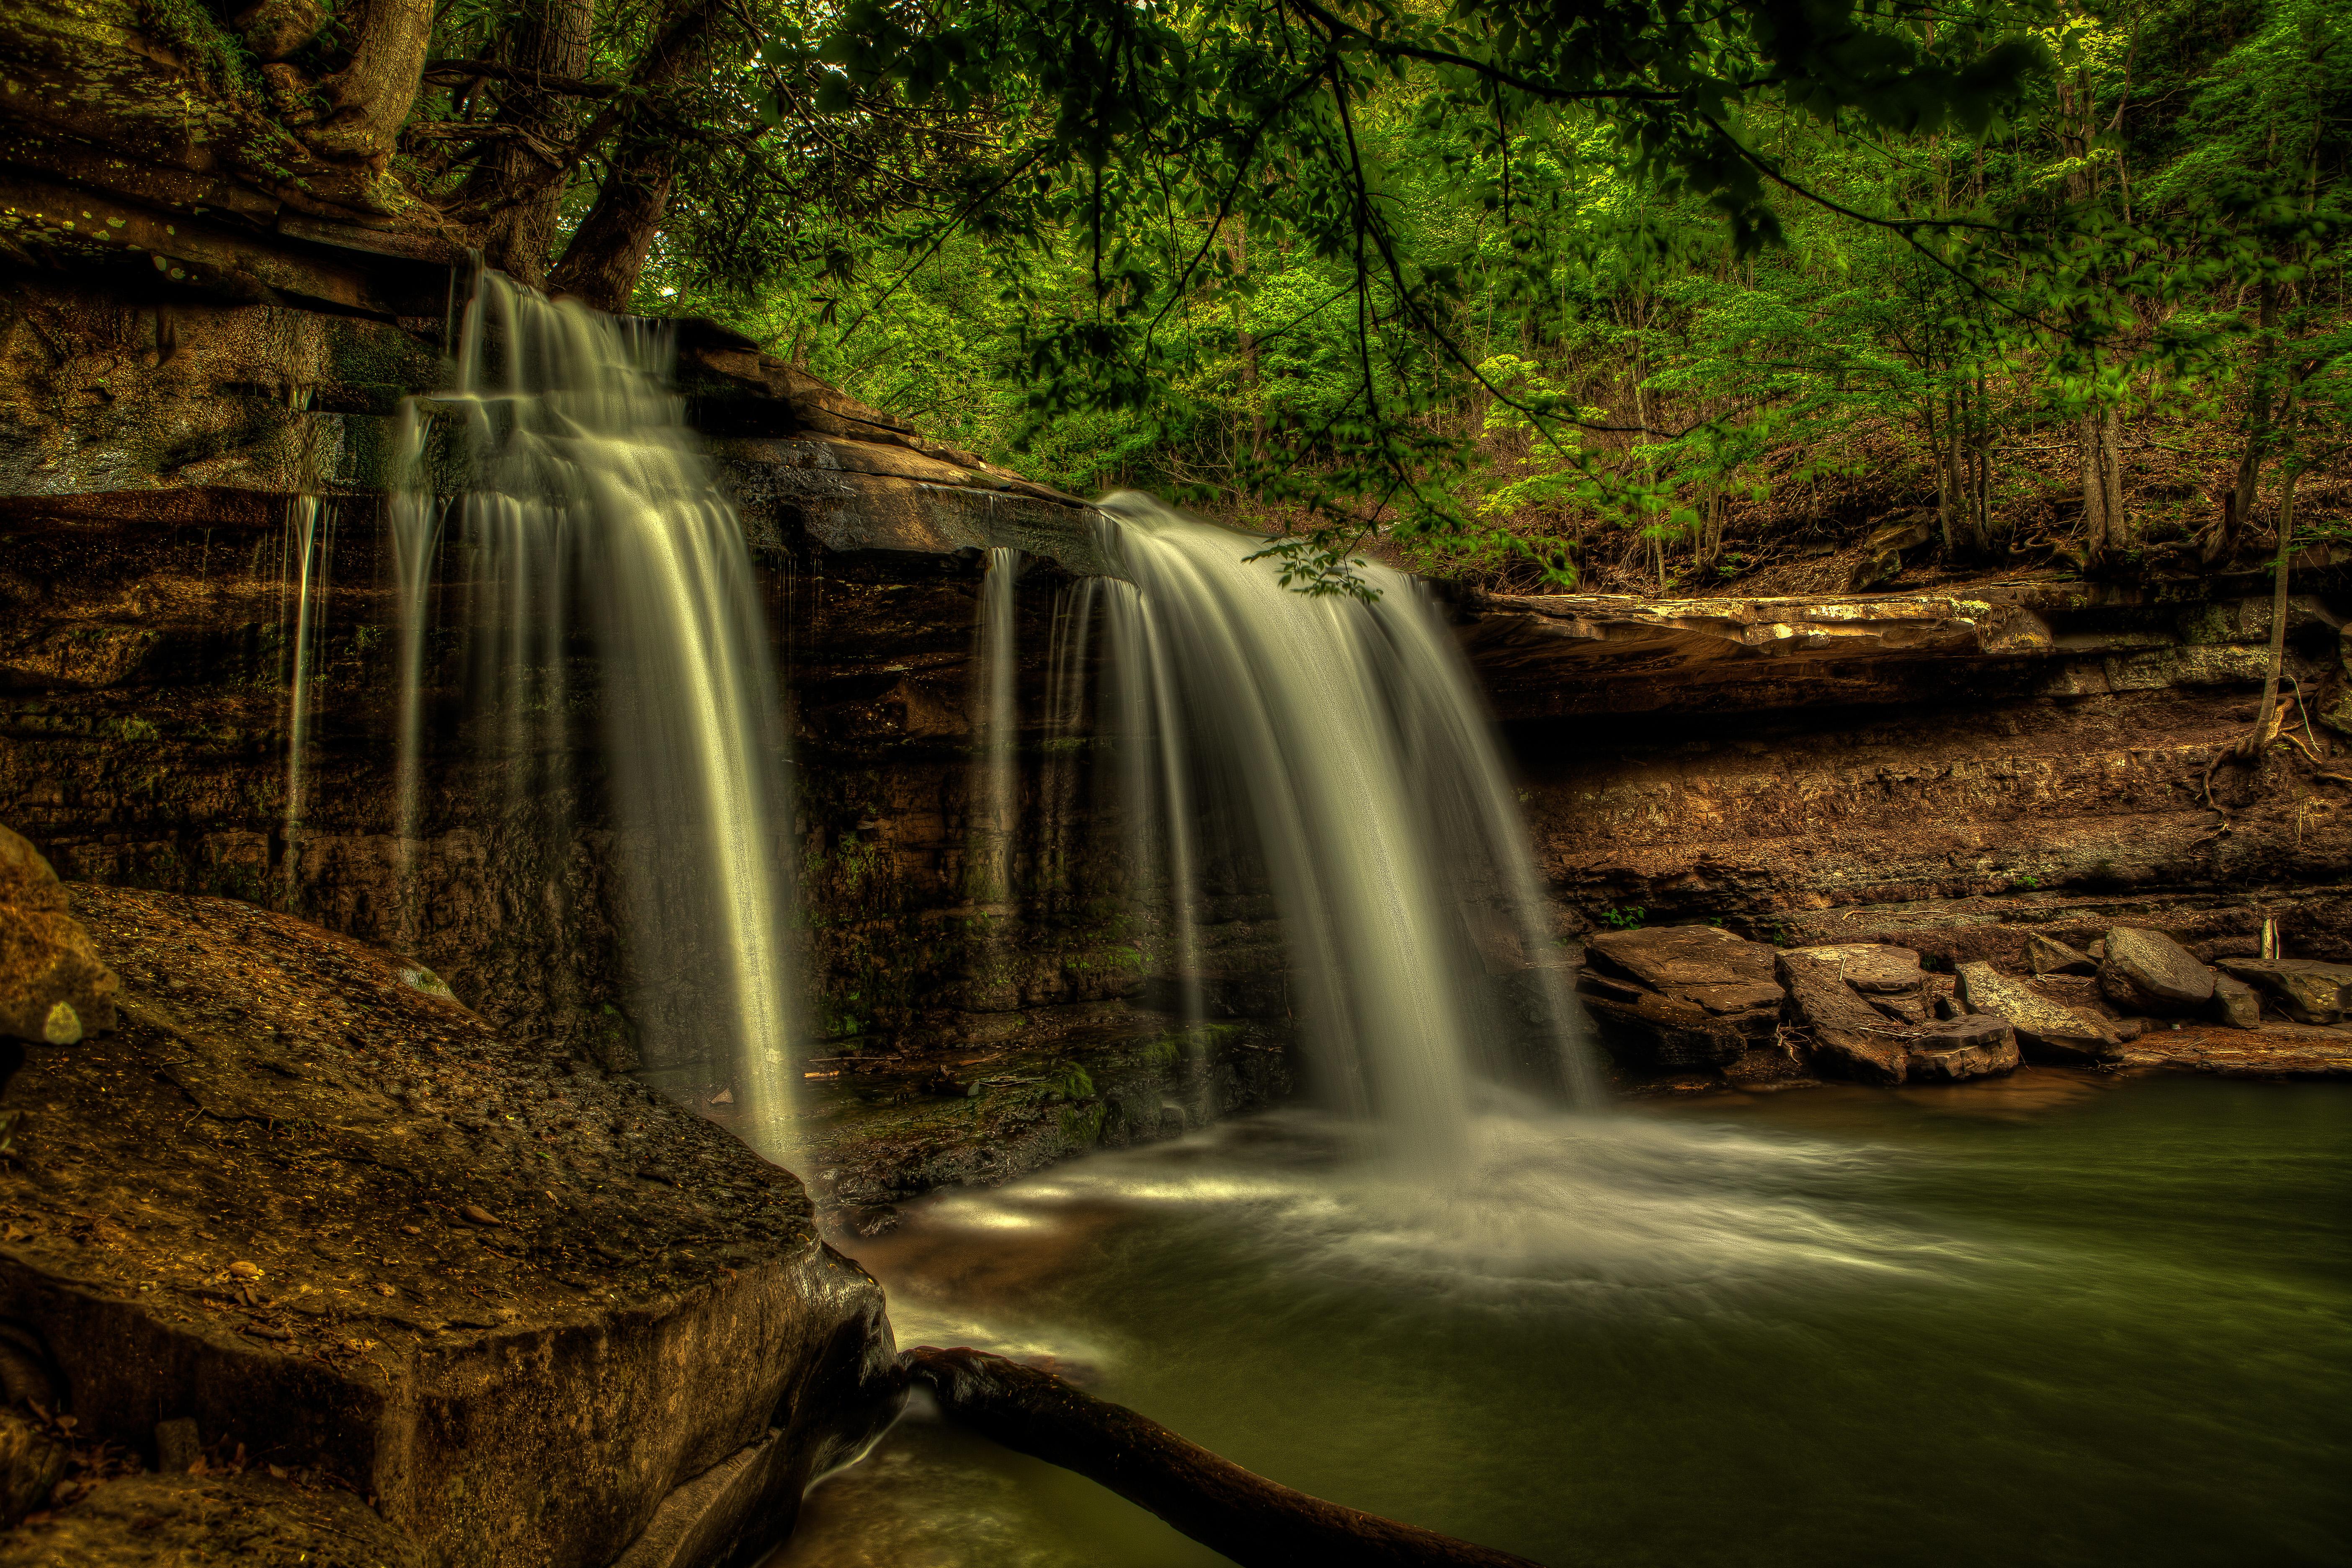 Claypool Falls, west virginia, водопад